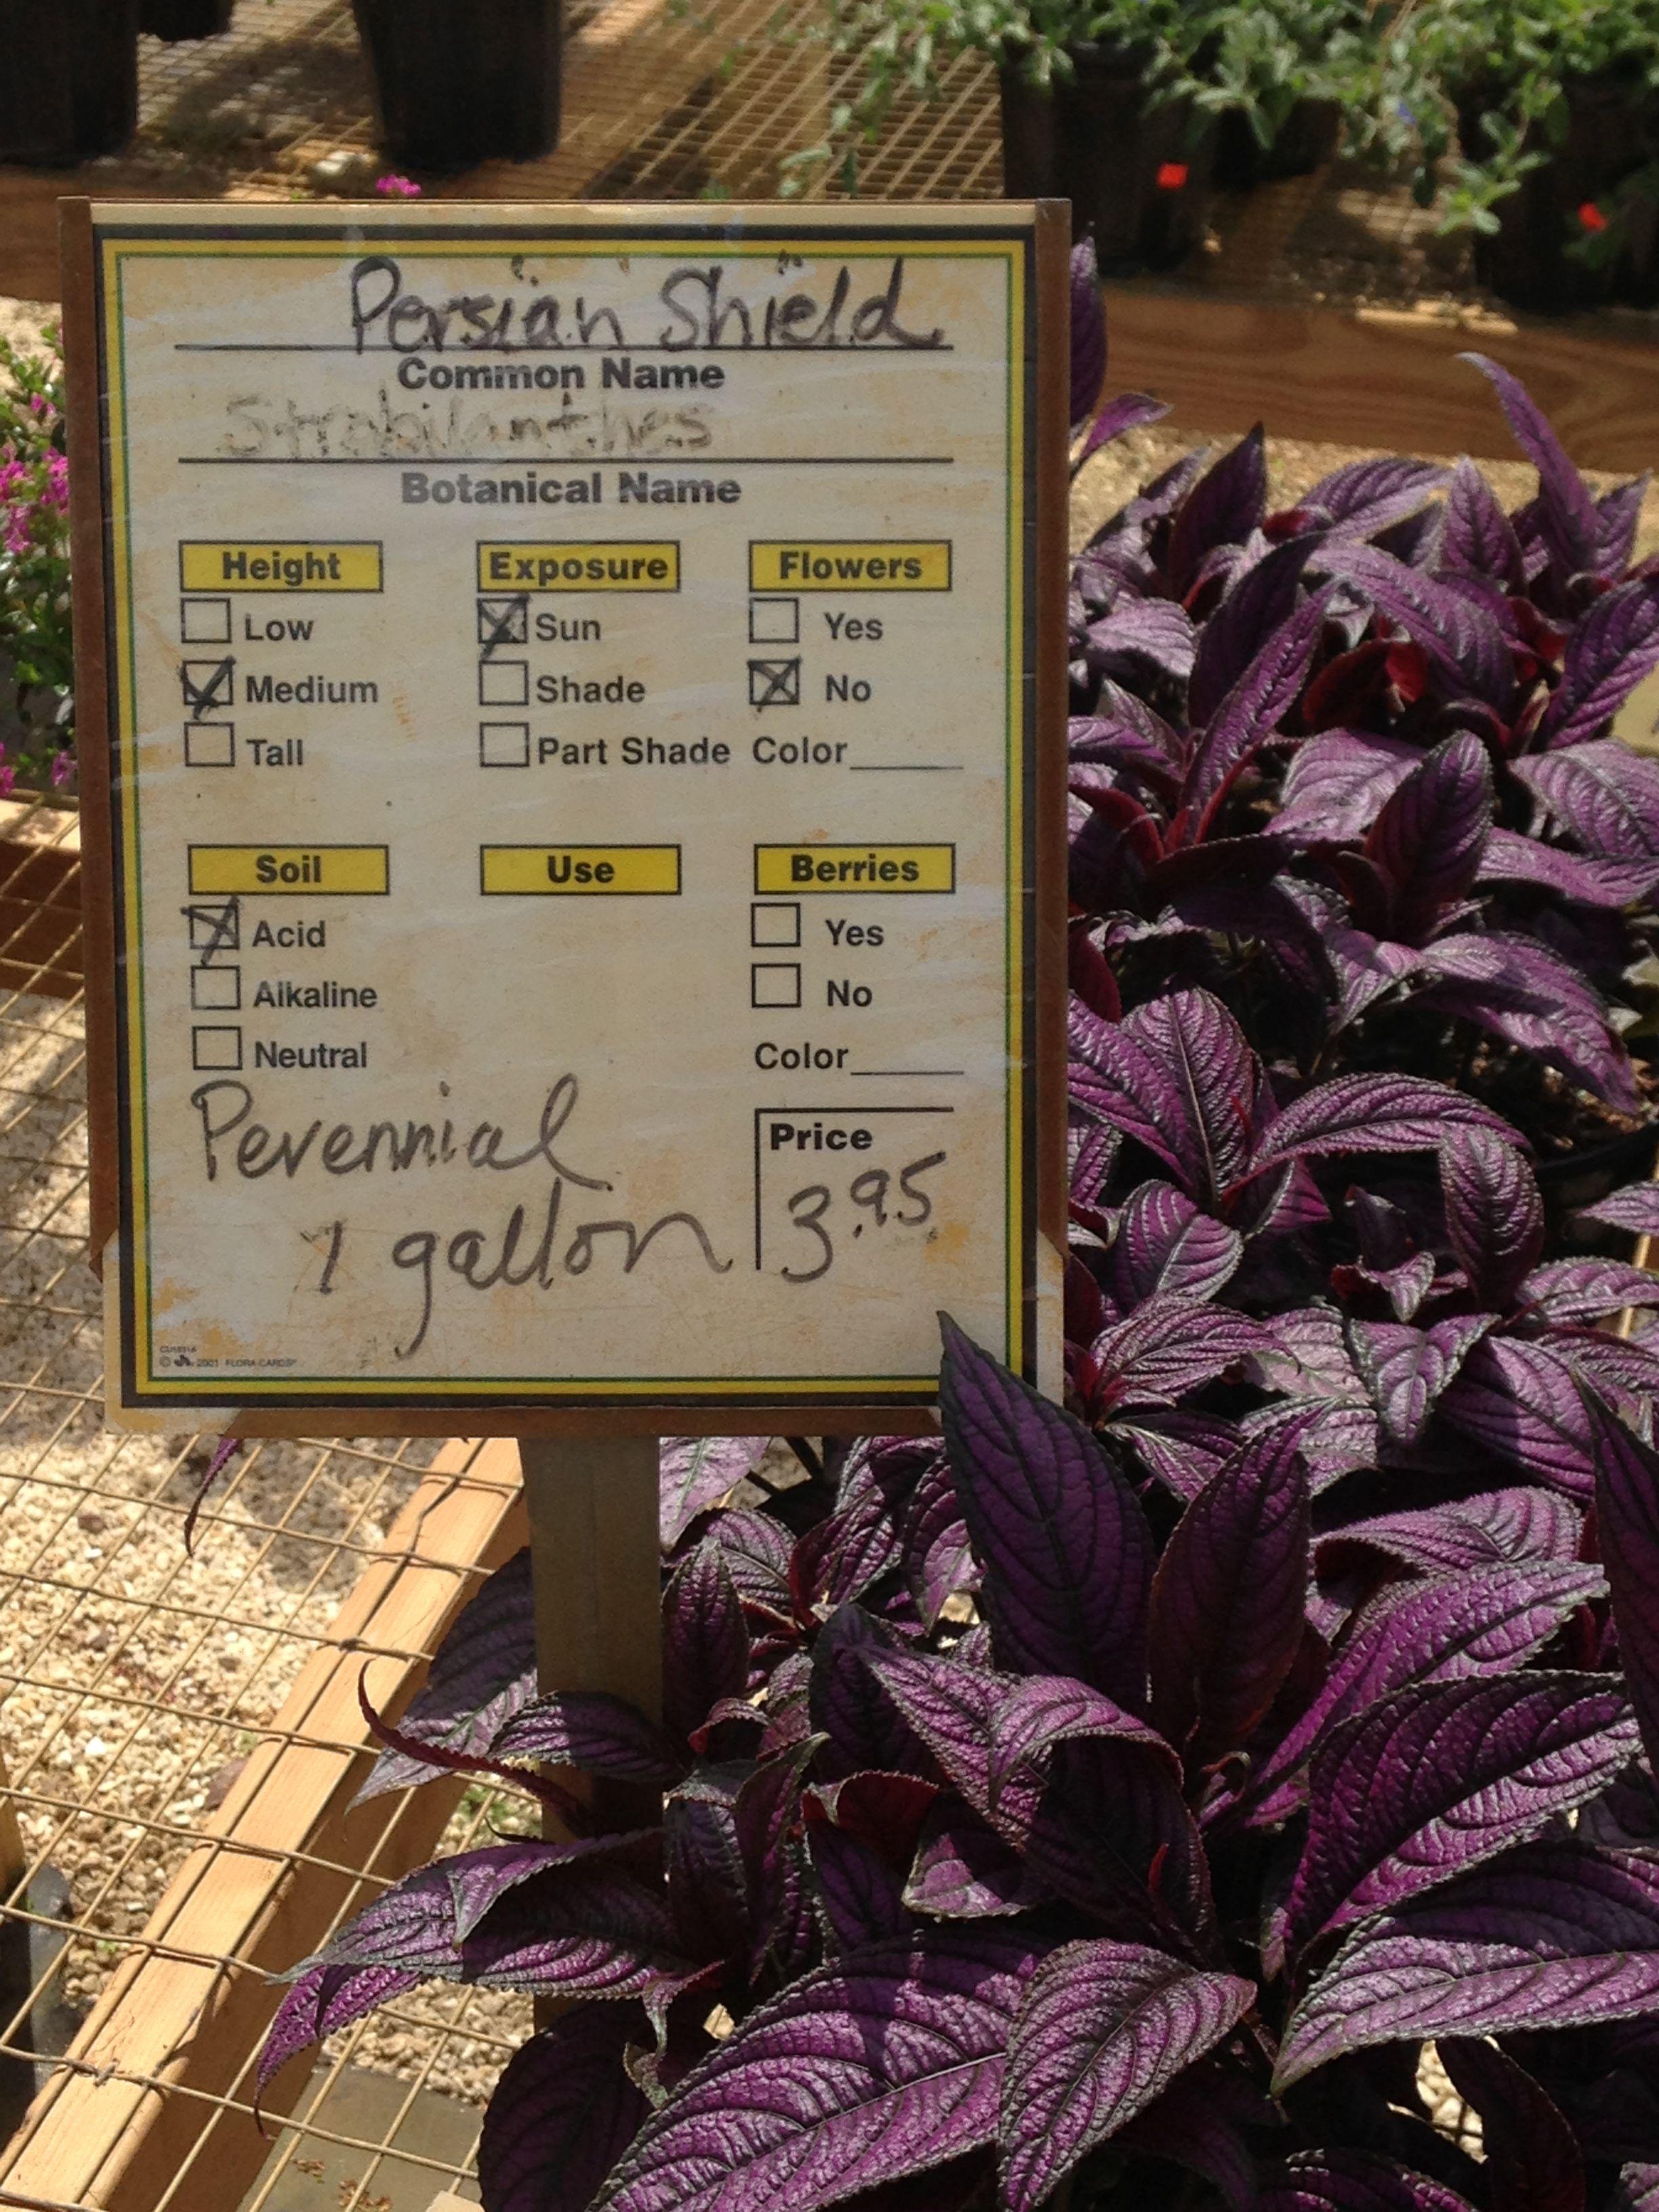 Persian shield. Purple leaves